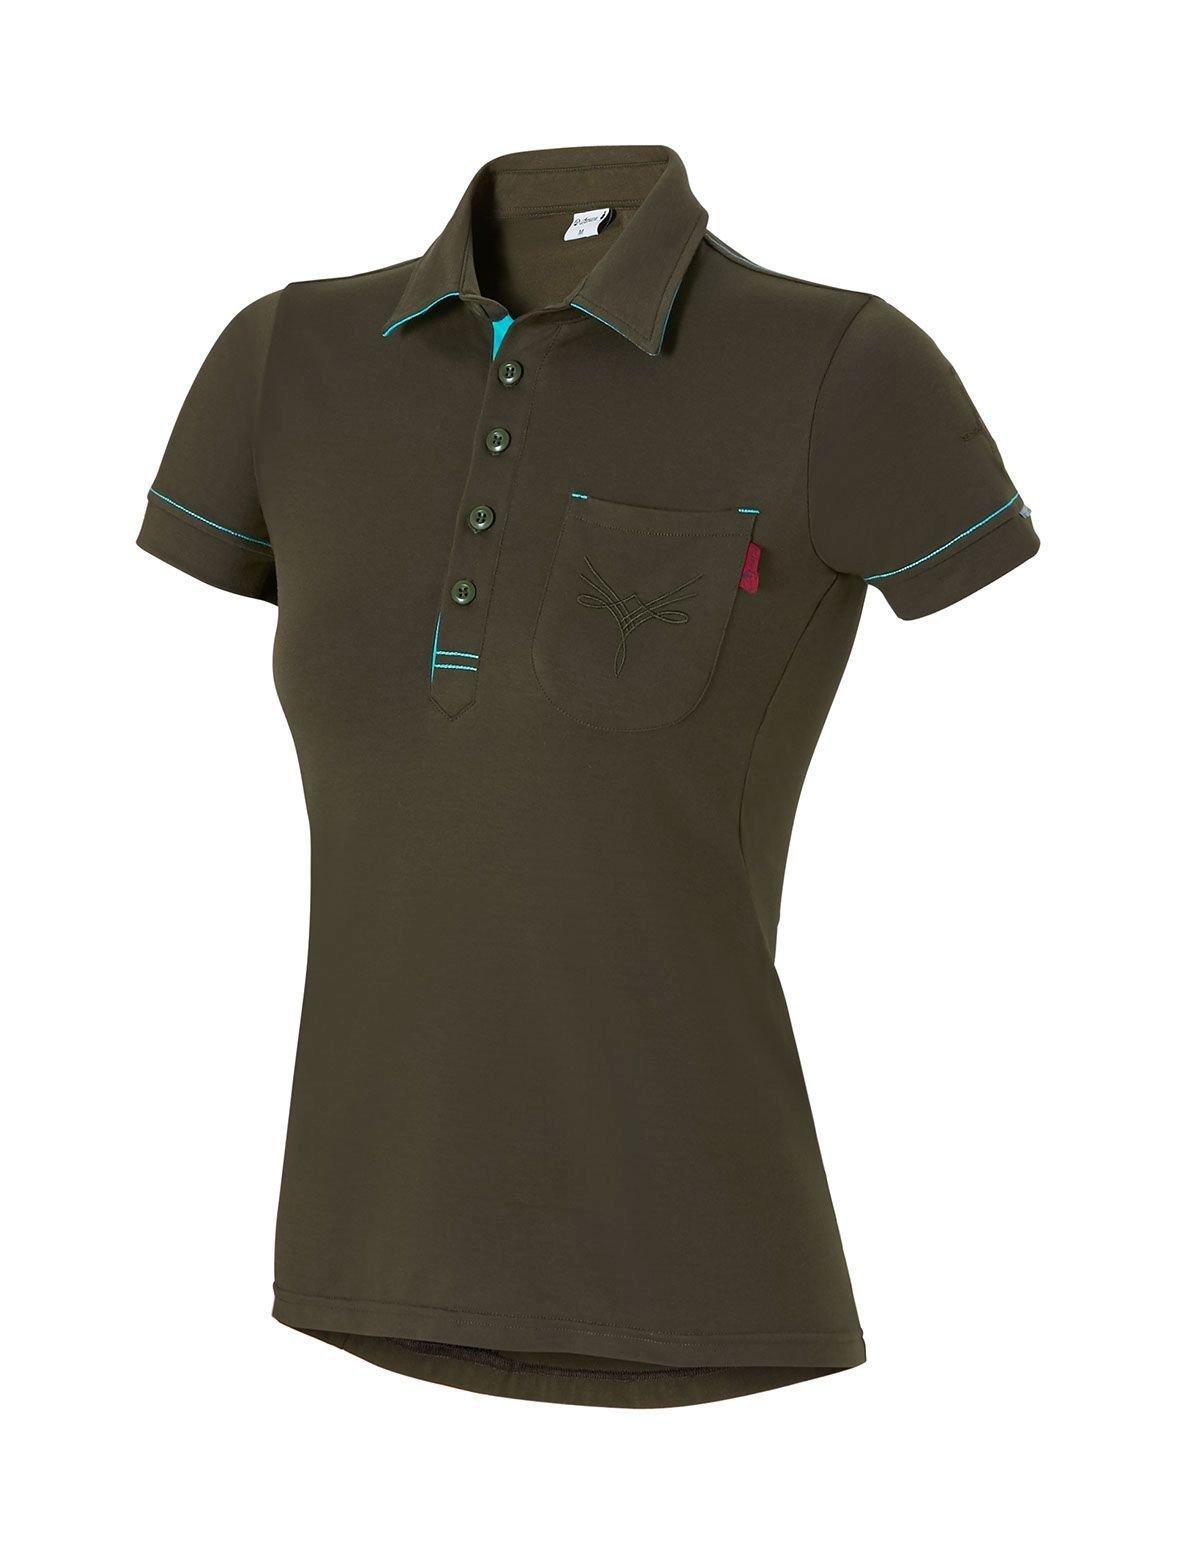 bekleidung/T-Shirts: Apura  Airwave Damen Polo  L